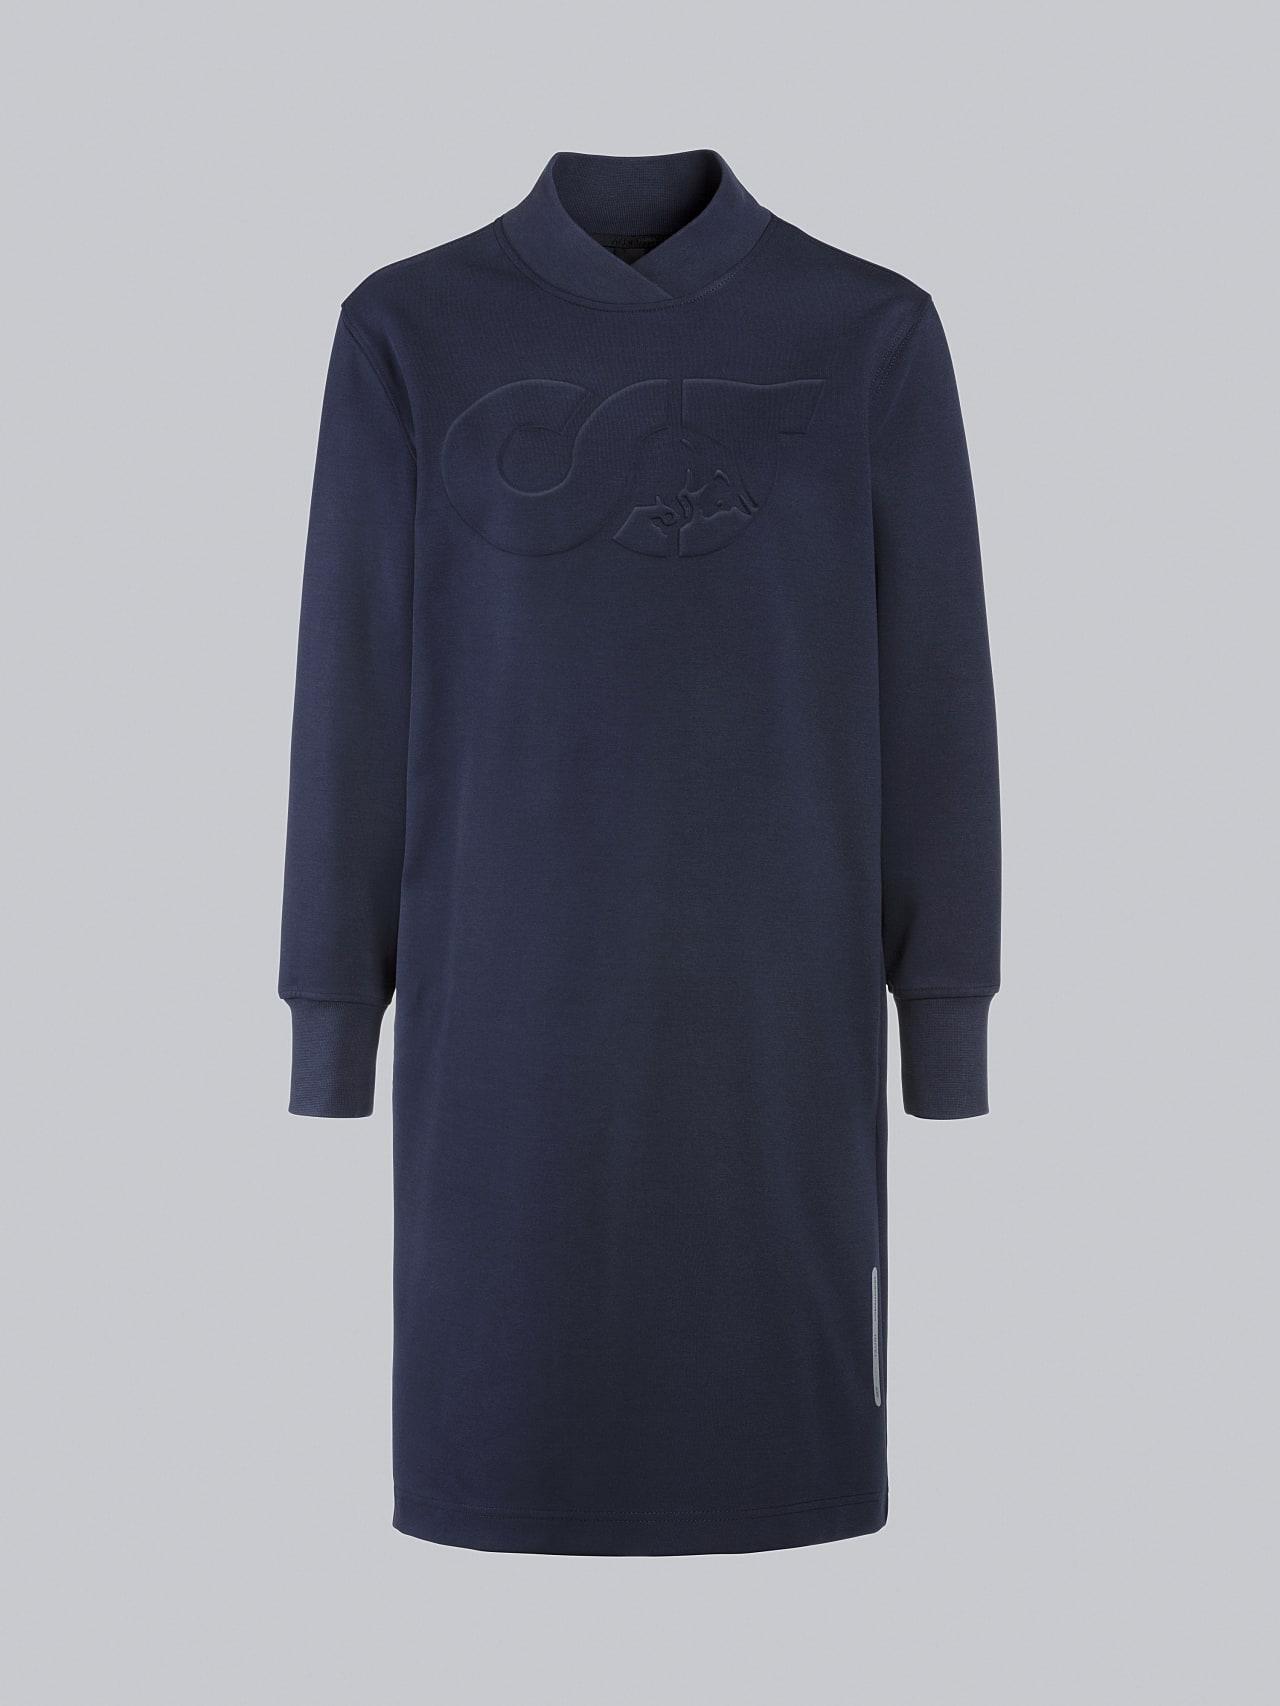 STAR V3.Y5.02 Premium Logo Sweater Dress navy Back Alpha Tauri